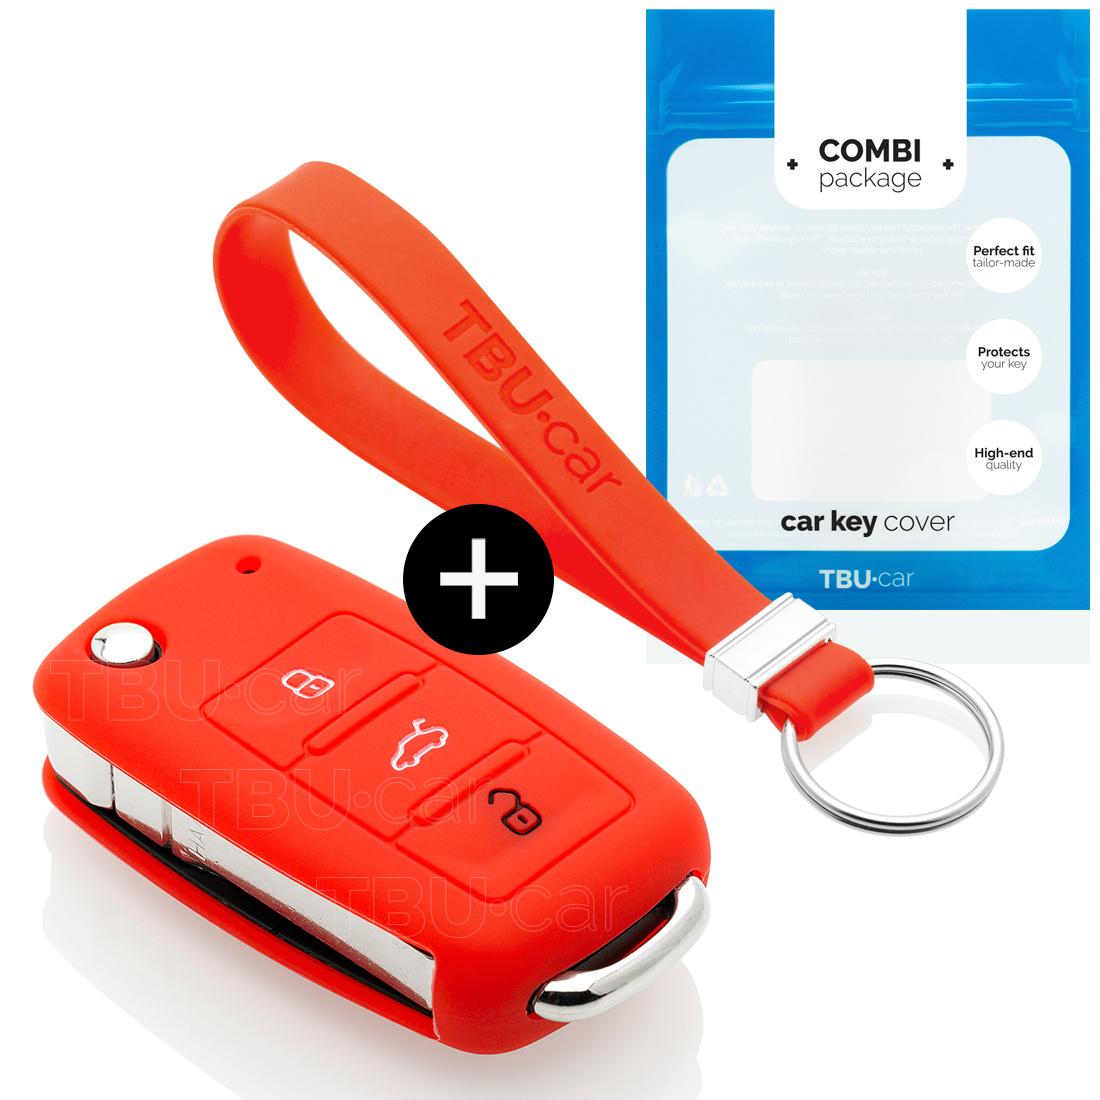 TBU car TBU car Sleutel cover compatibel met Skoda - Silicone sleutelhoesje - beschermhoesje autosleutel - Rood